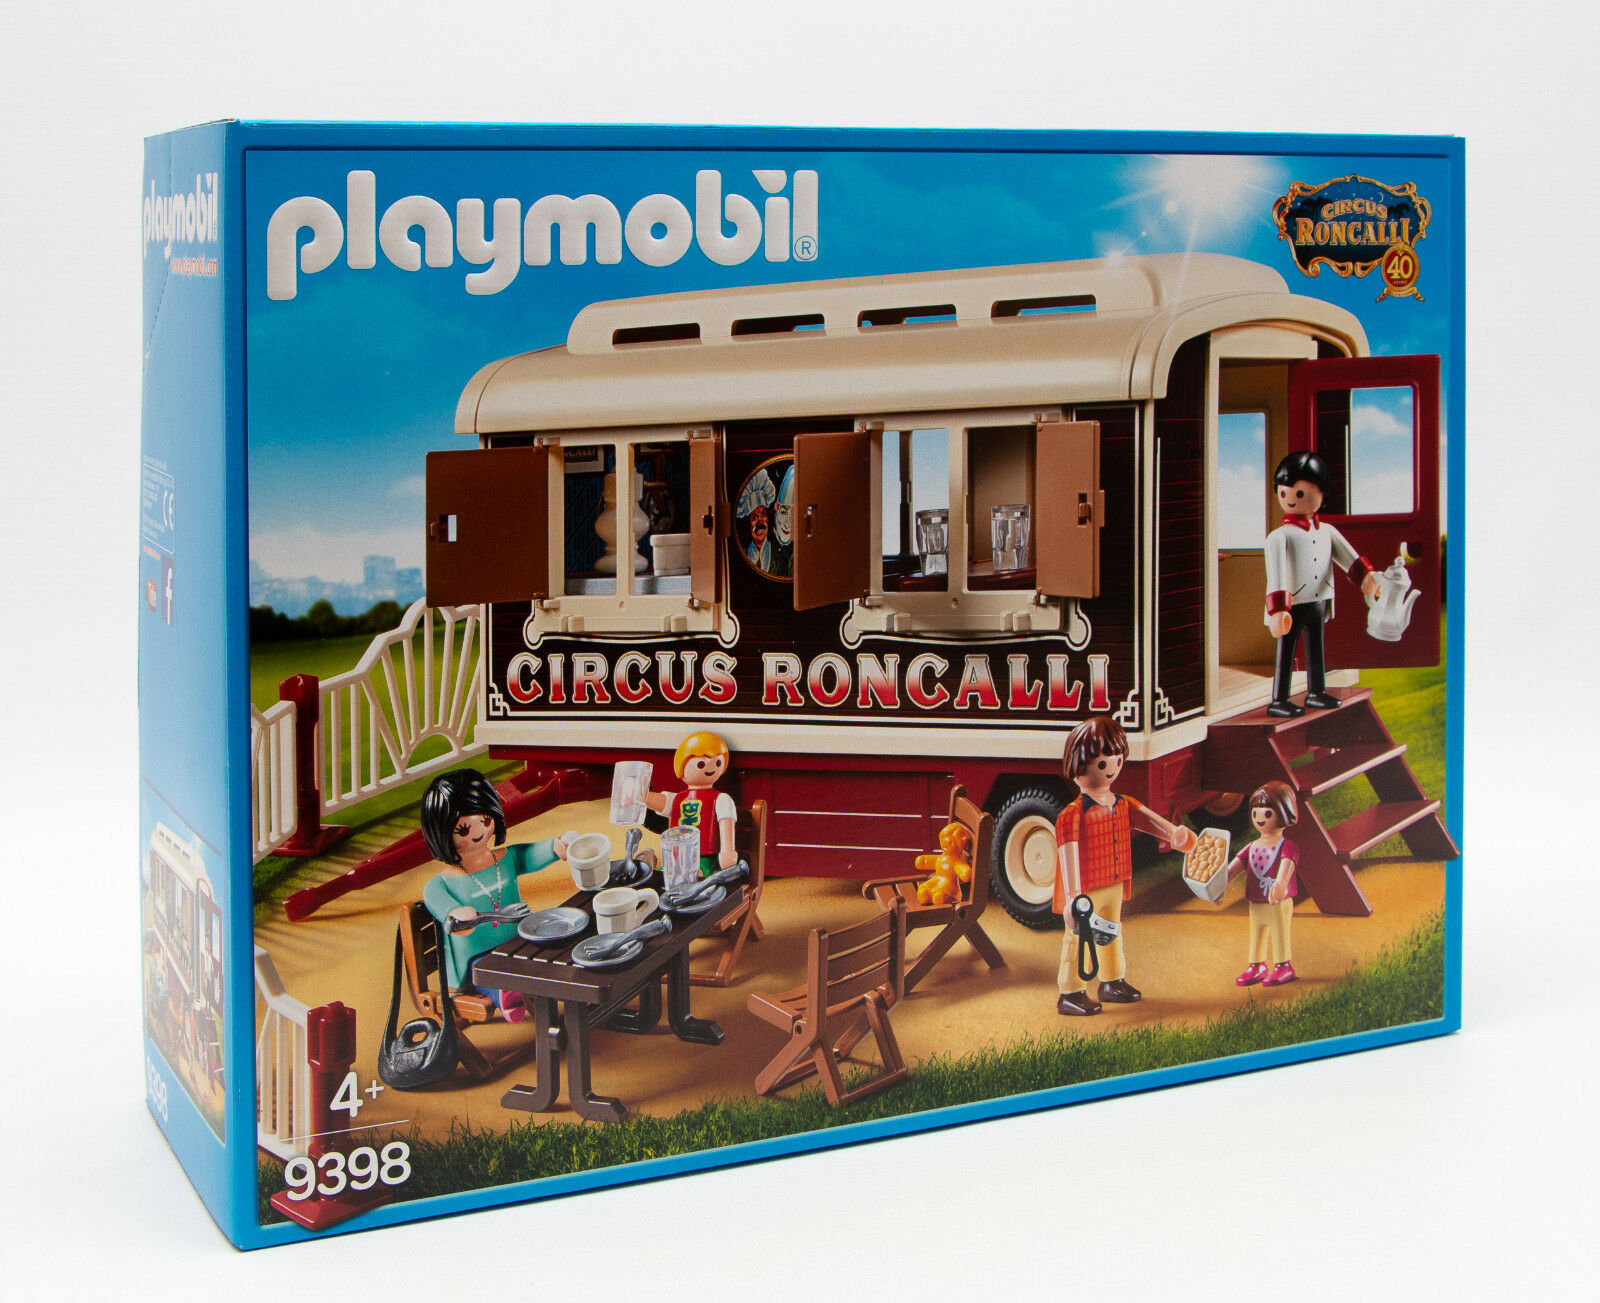 Playmobil 9398 Exklusiv Circus Roncalli Wohnwagen mit Figuren NEU / OVP